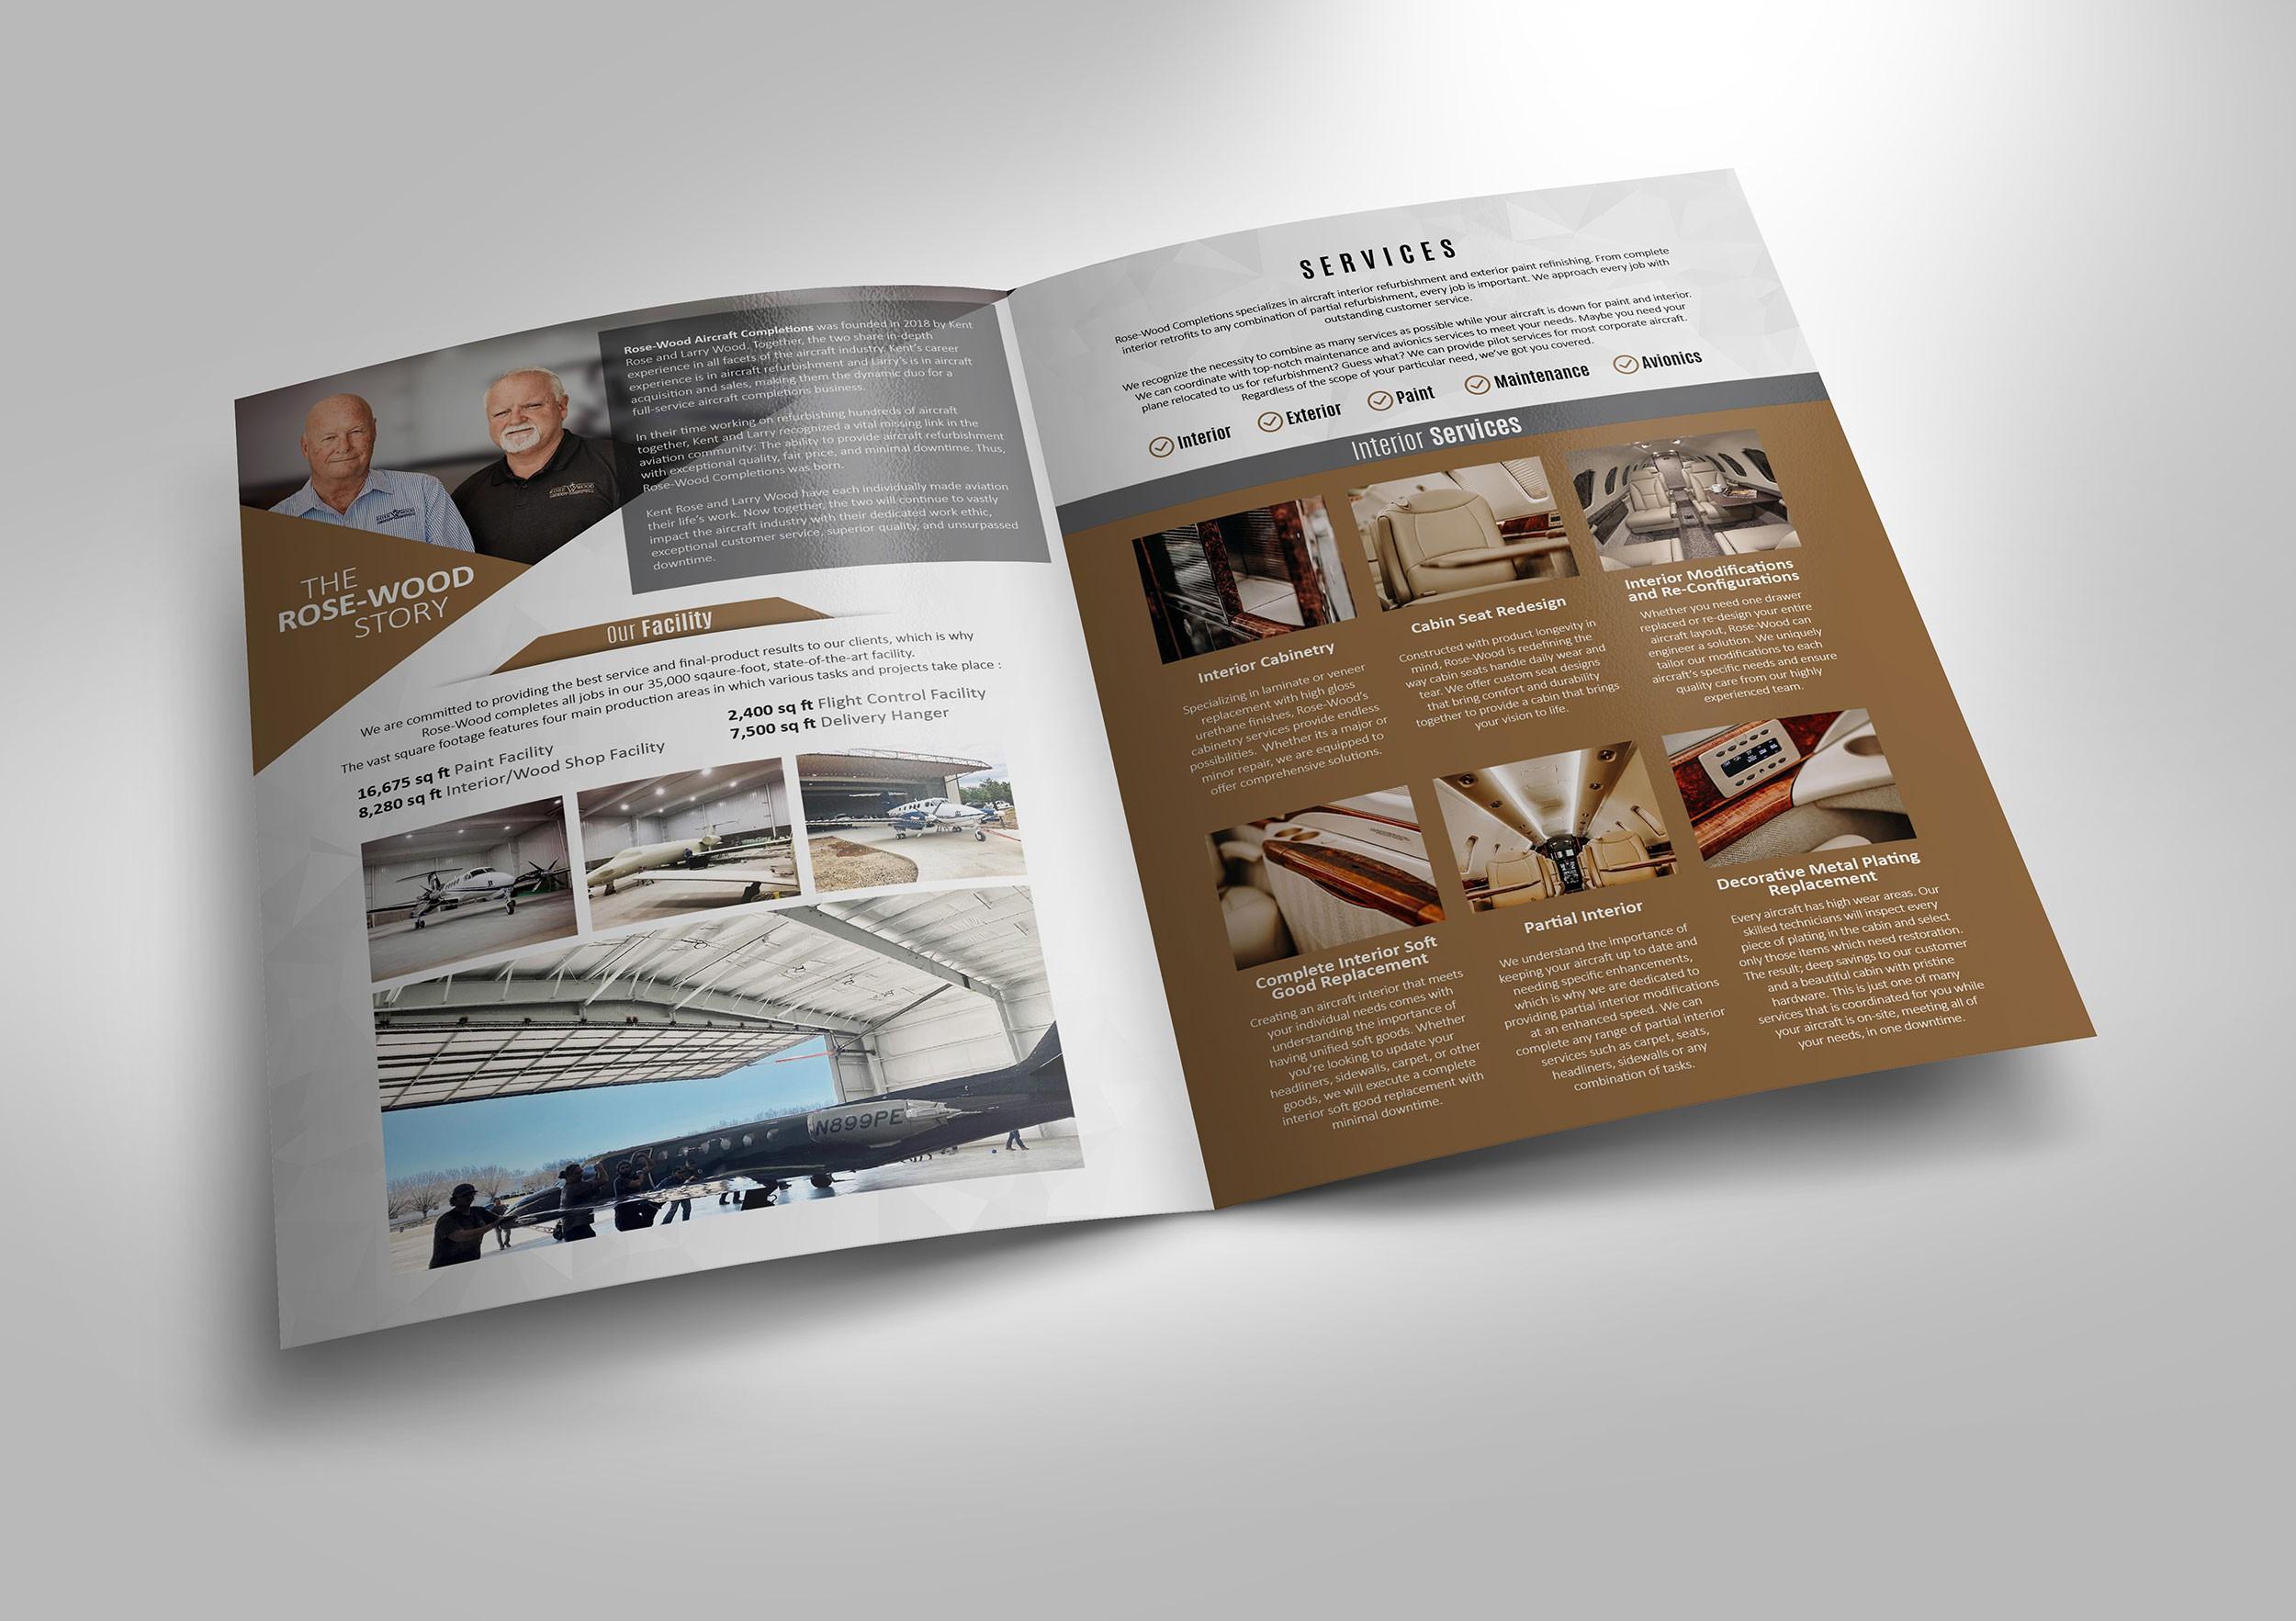 JETS! Easy money! Design brochure for Aviation